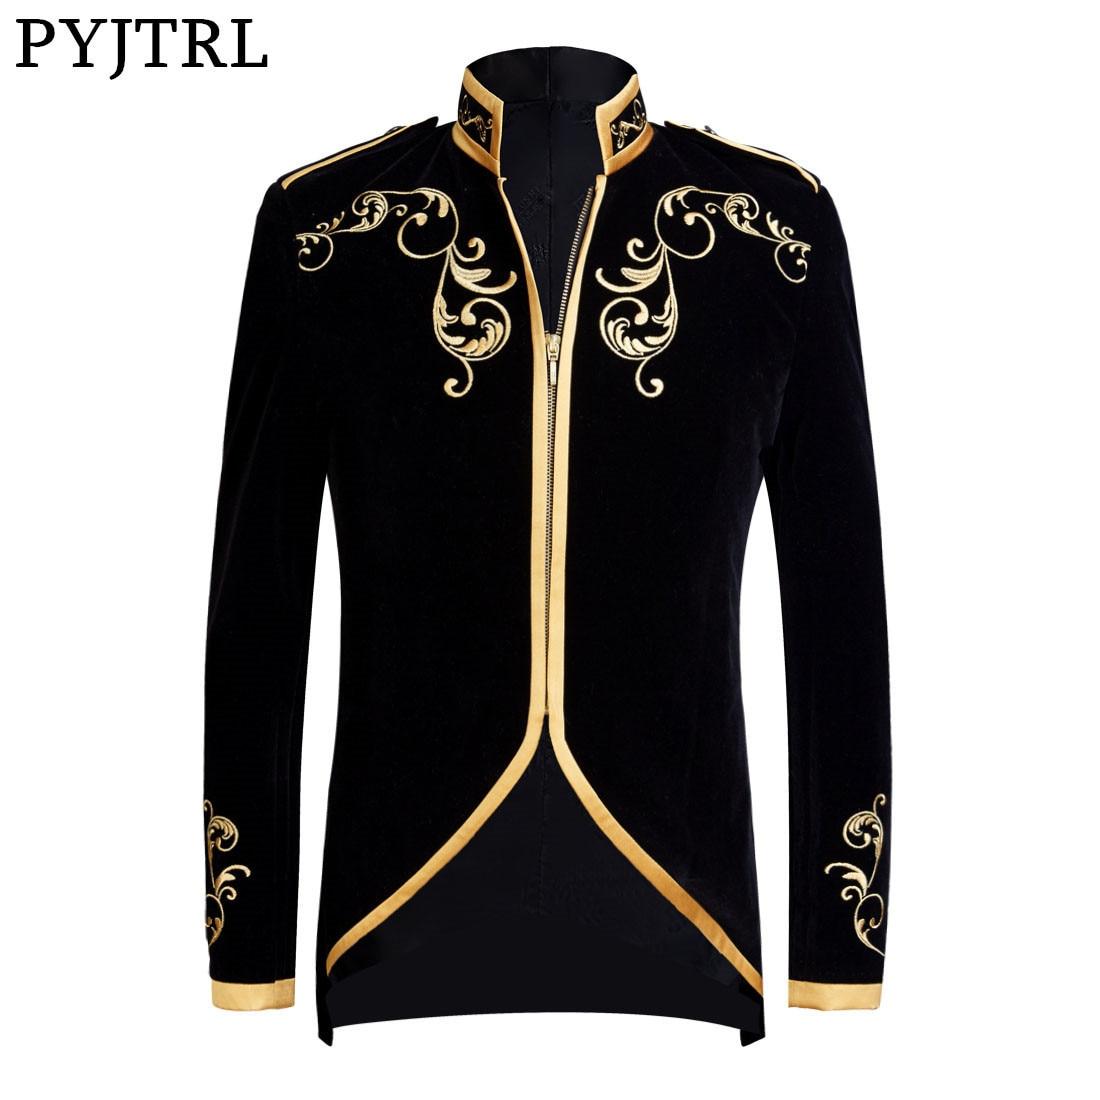 PYJTRL בריטי סגנון ארמון נסיך אופנה שחור קטיפה זהב רקמה בלייזר חתונה חתן Slim Fit חליפת מעיל זמרים מעיל